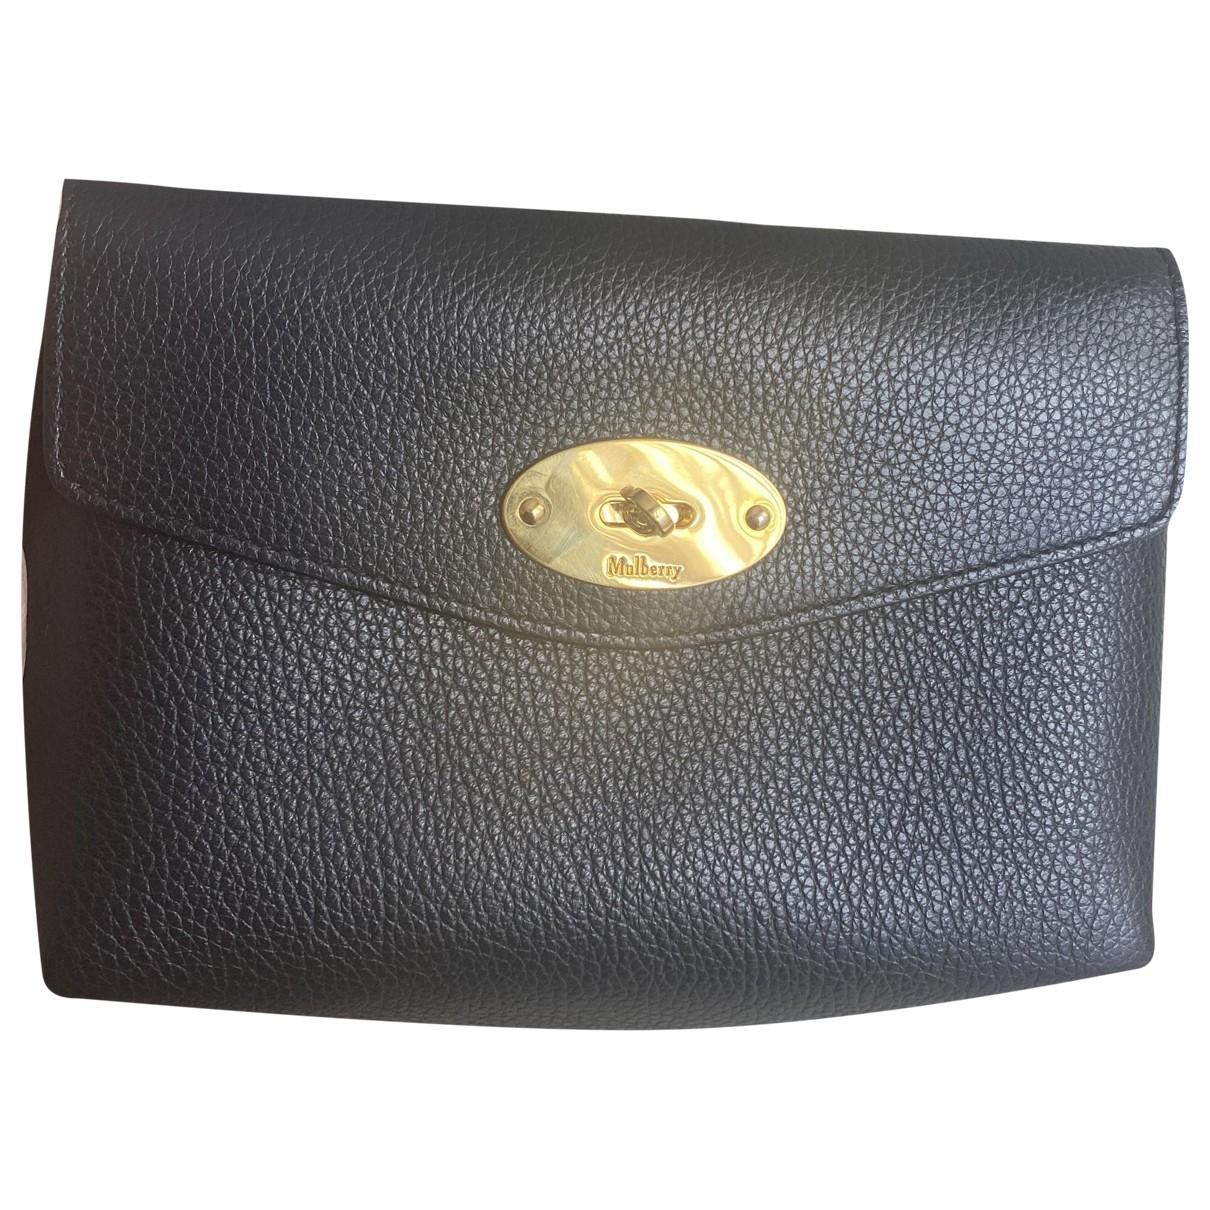 Mulberry \N Black Leather Clutch bag for Women \N